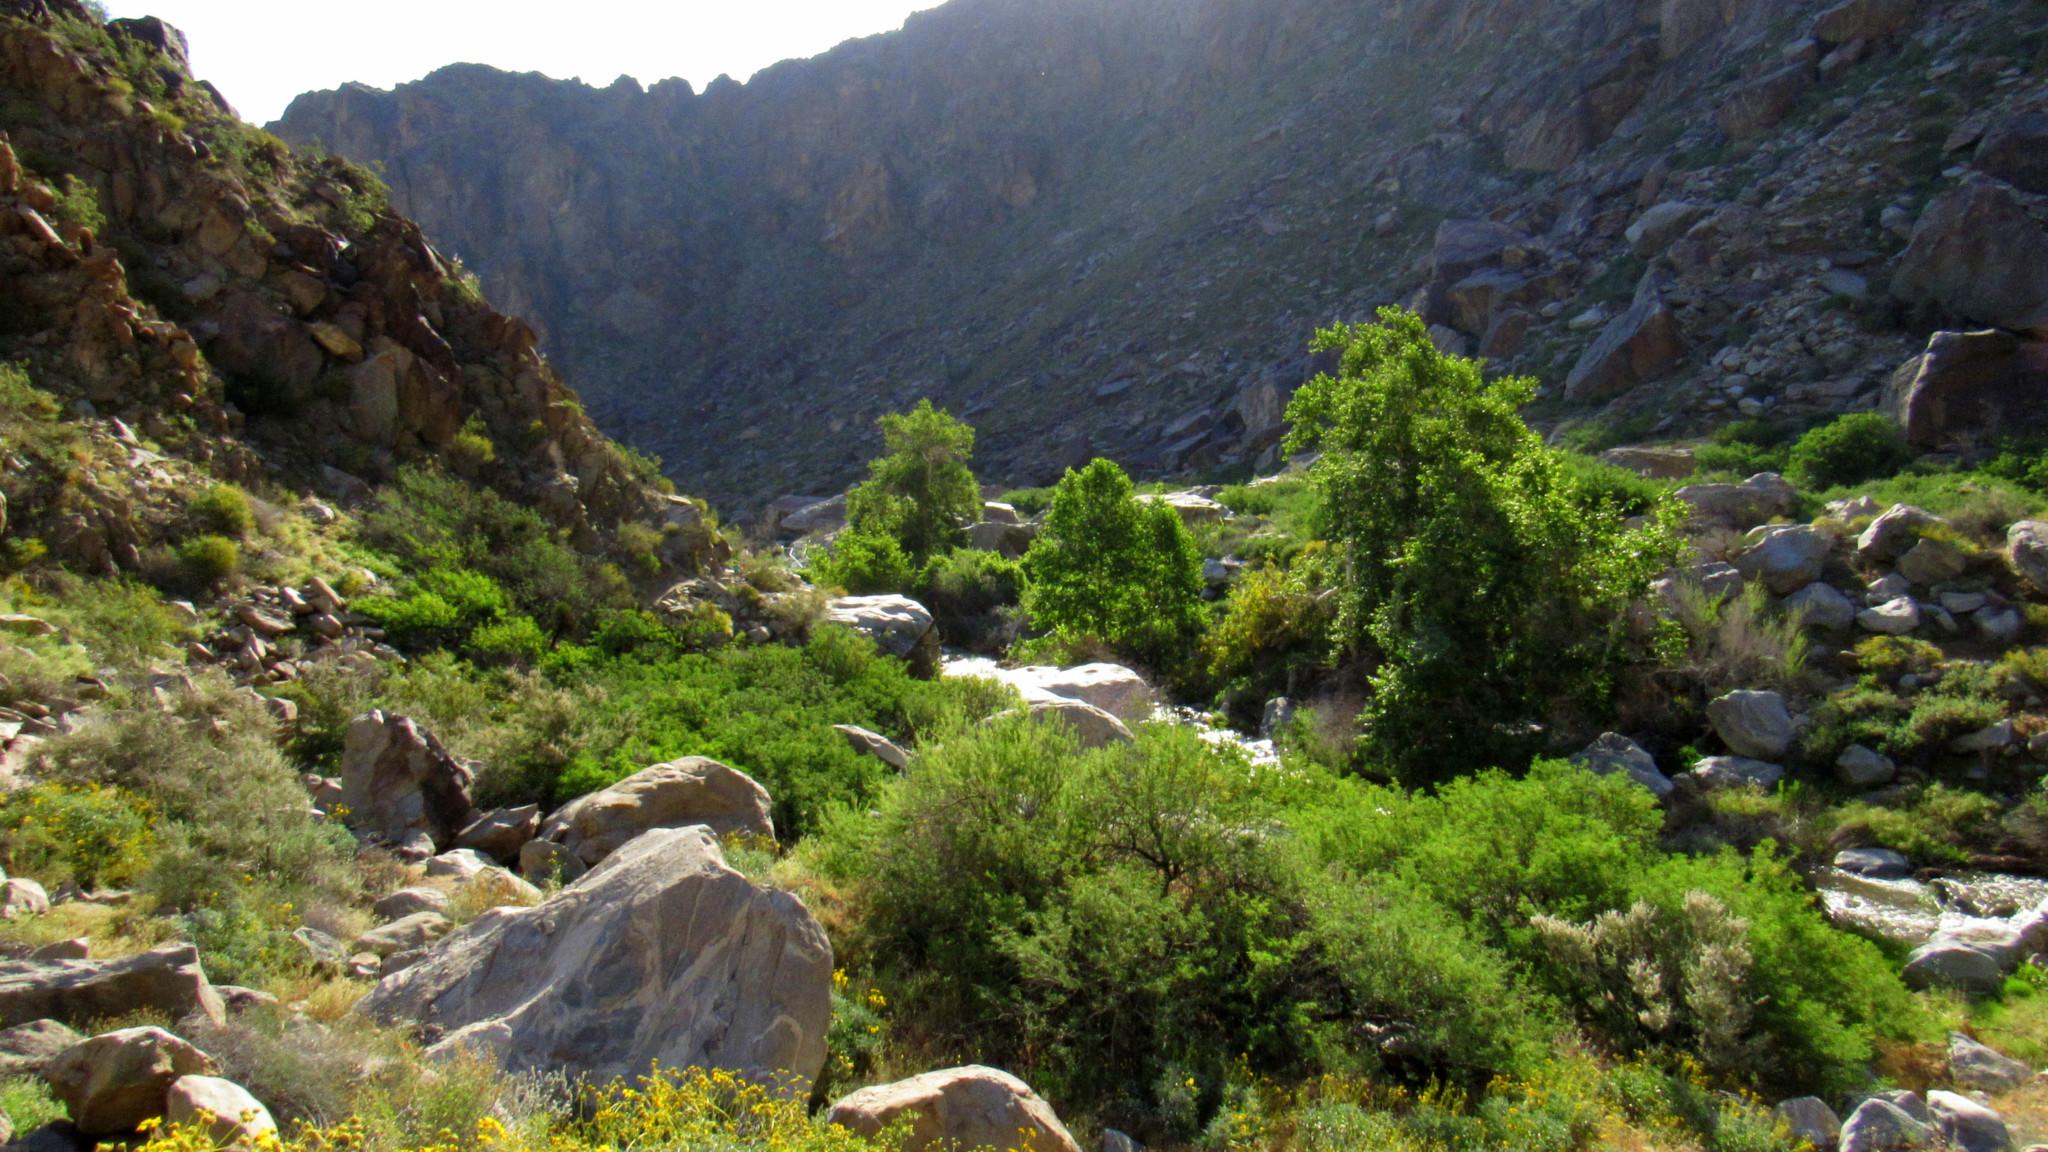 Tahquitz-Canyon-8-1.jpg